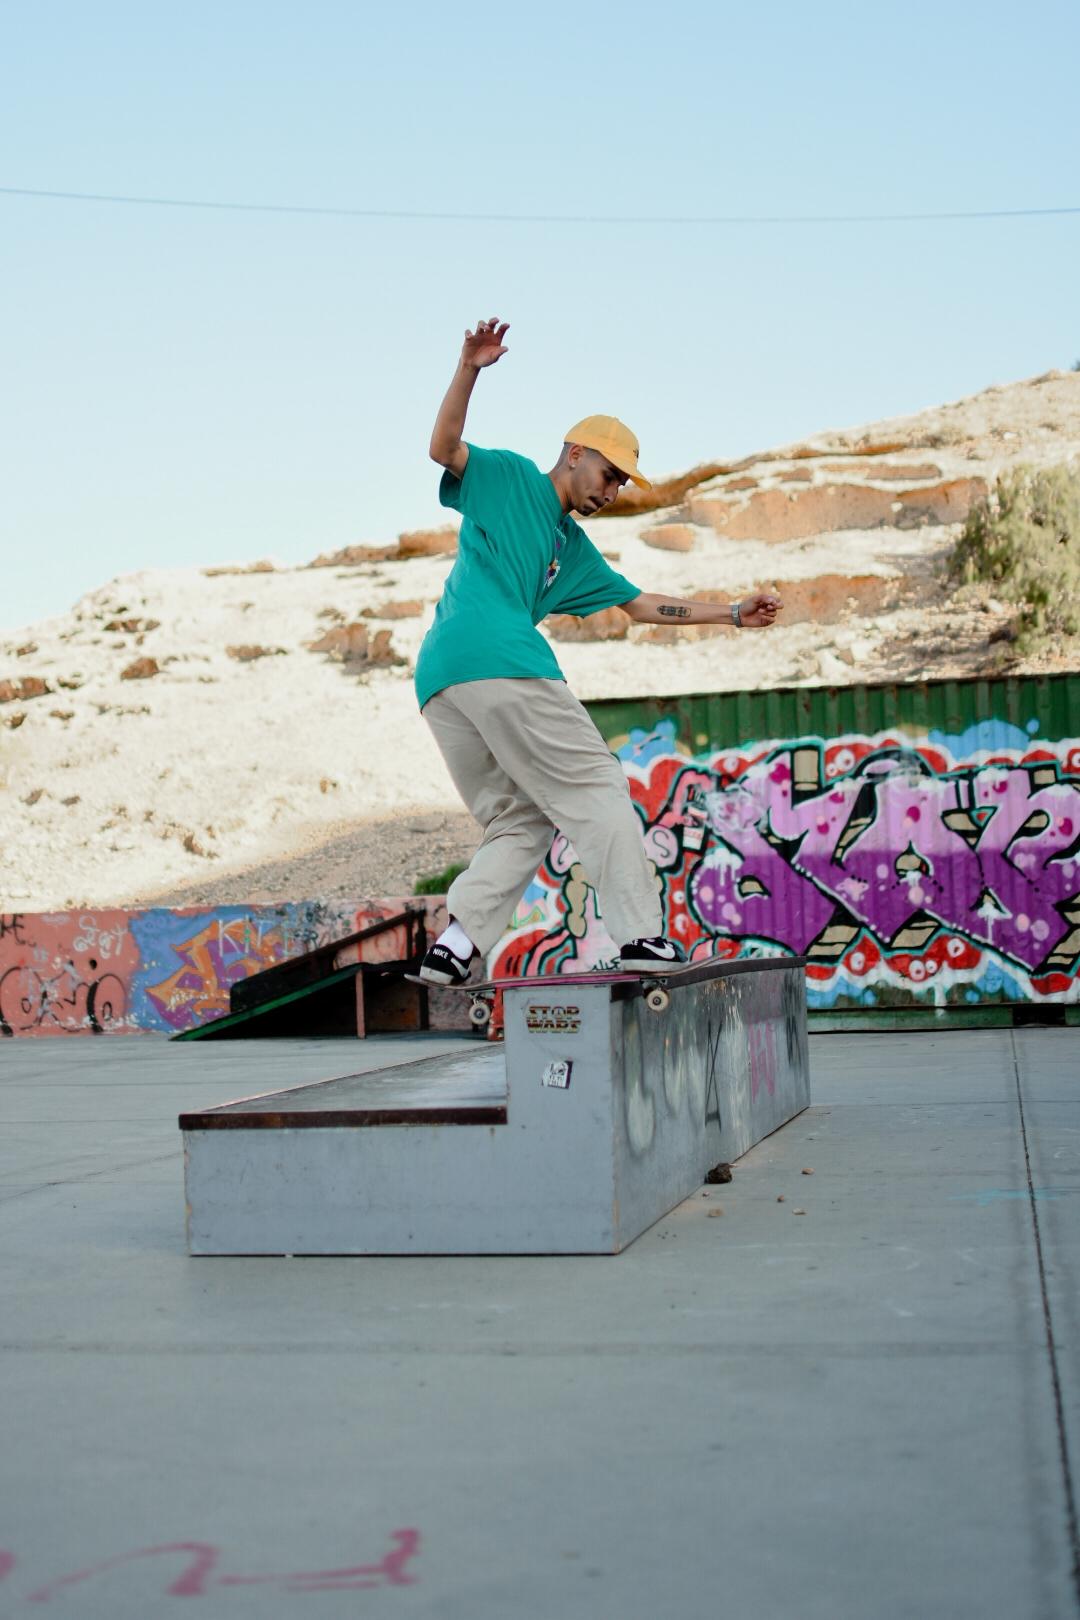 Fs Board / Bs Crooked - skate, skateboarding - svsogarcia | ello